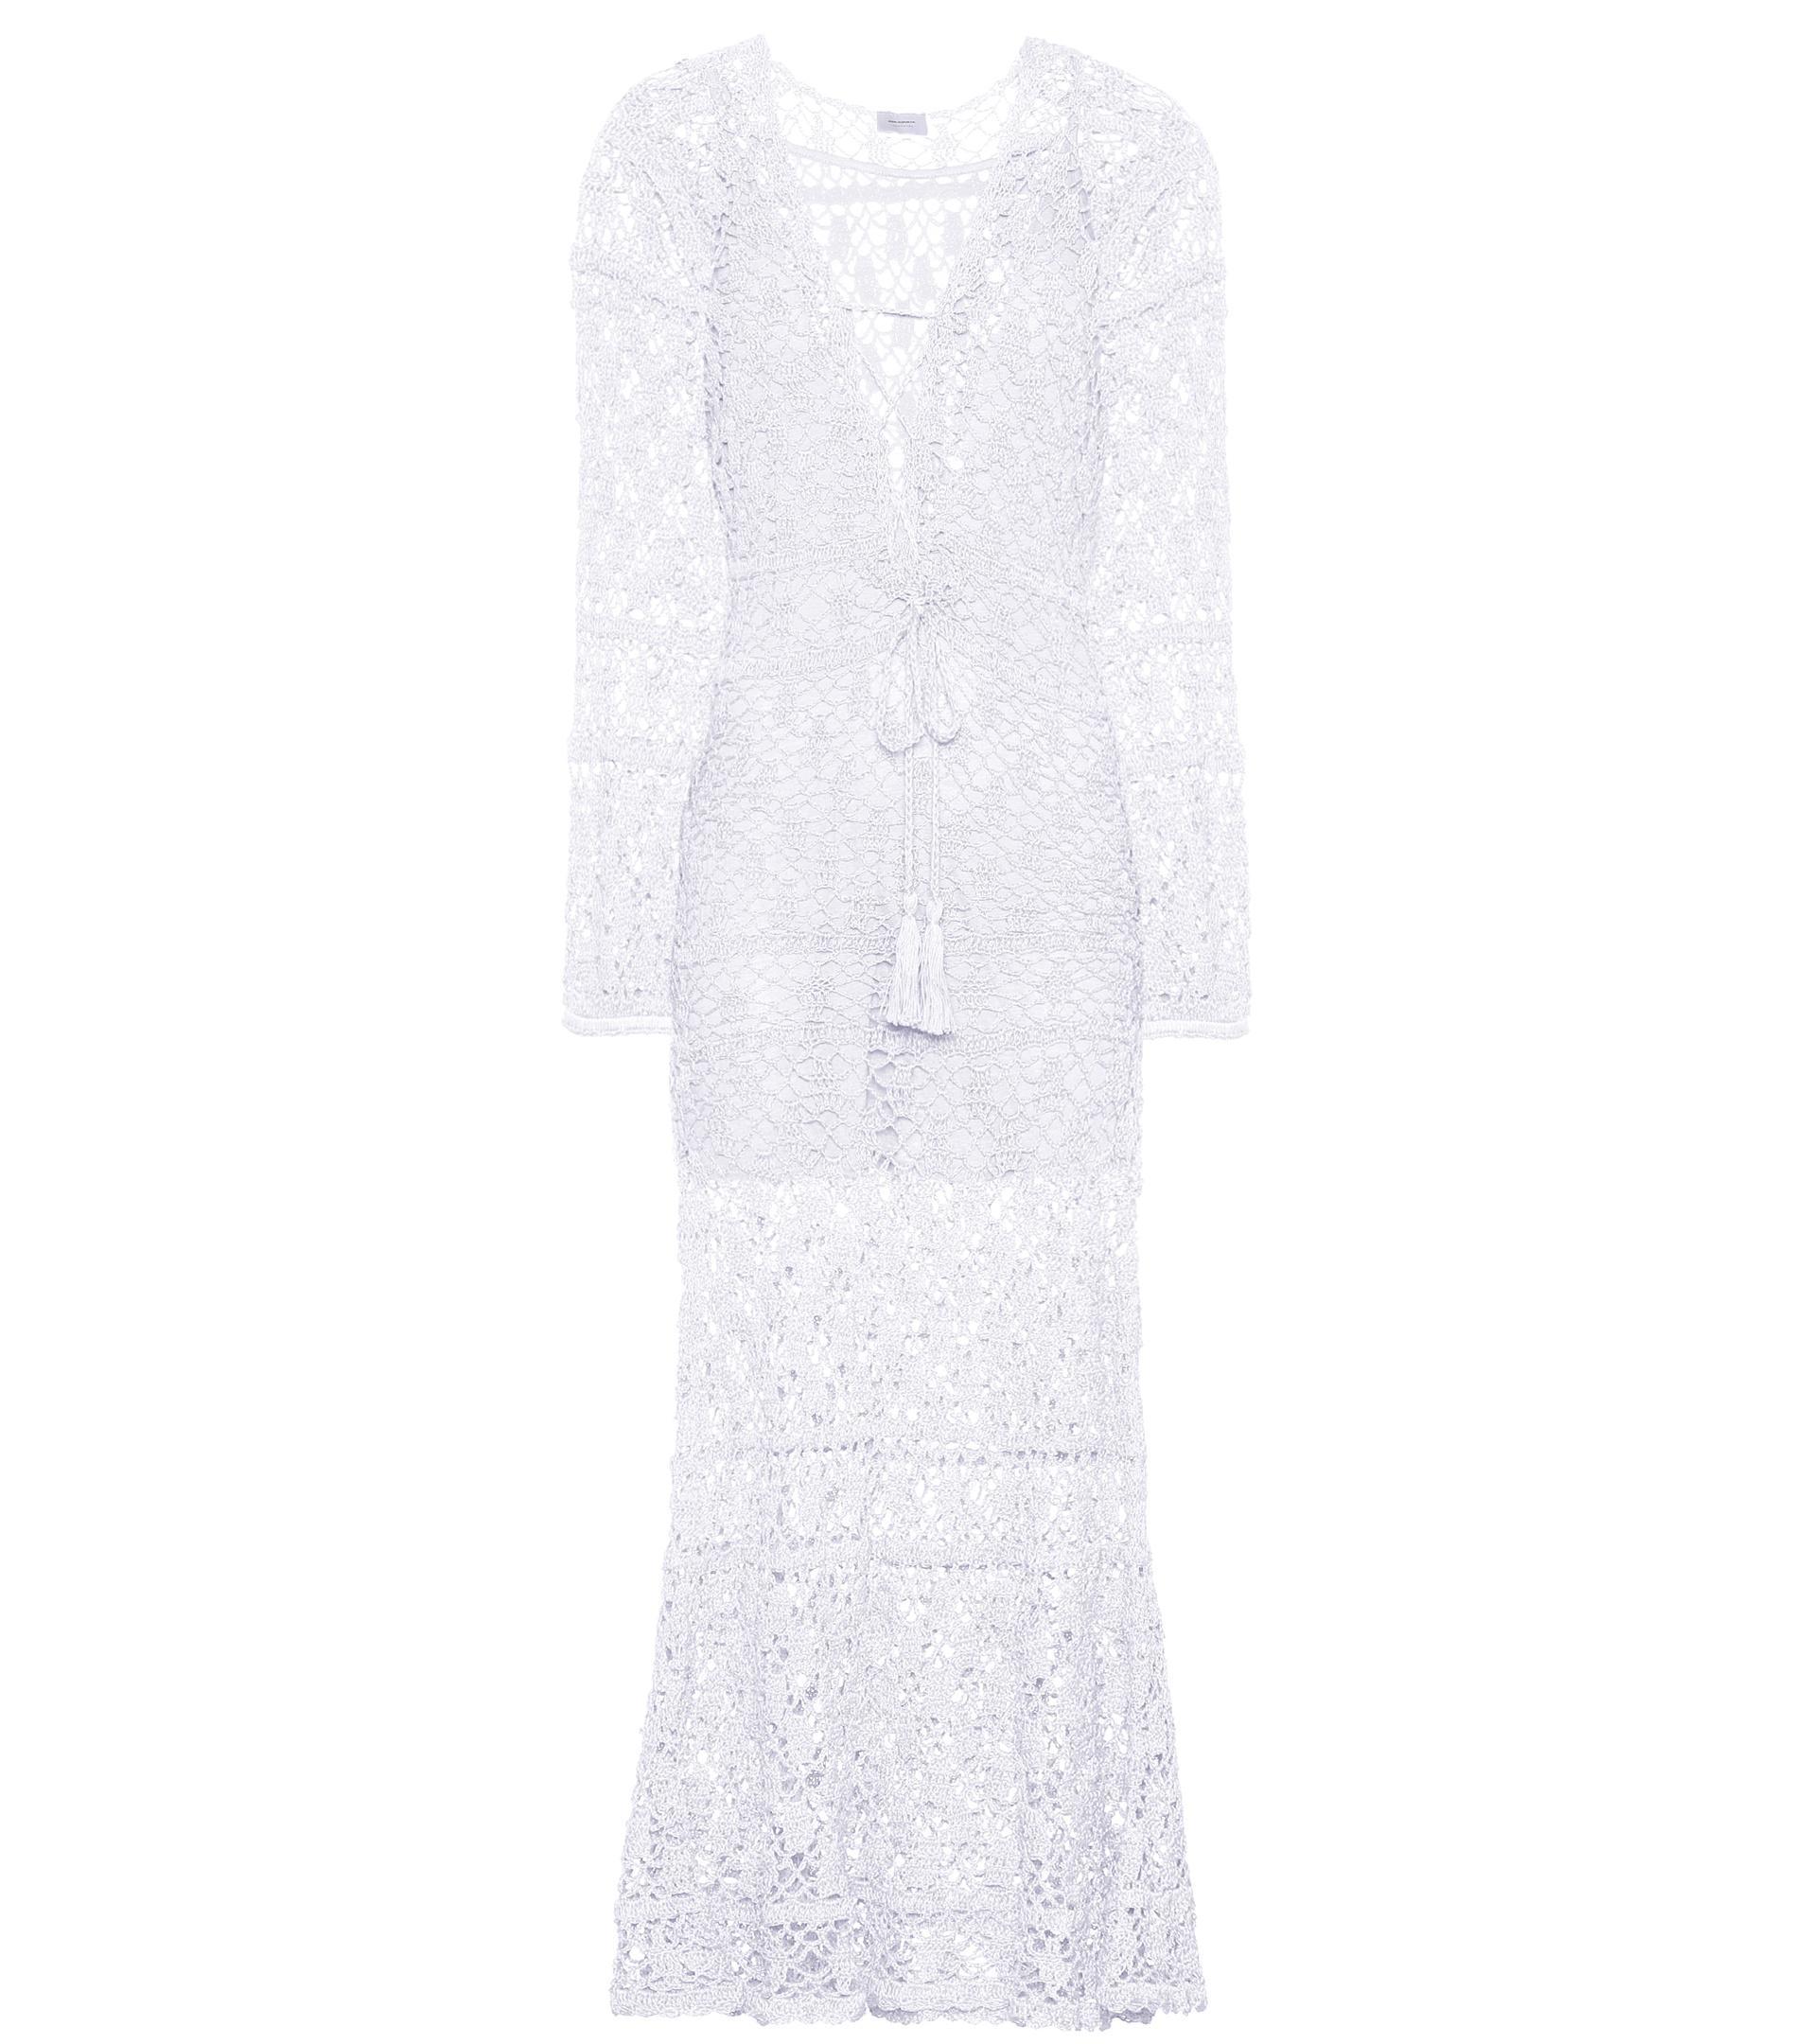 Bianca crocheted cotton dress Anna Kosturova Pictures Sale Online Outlet Brand New Unisex 1HSQ4Ed